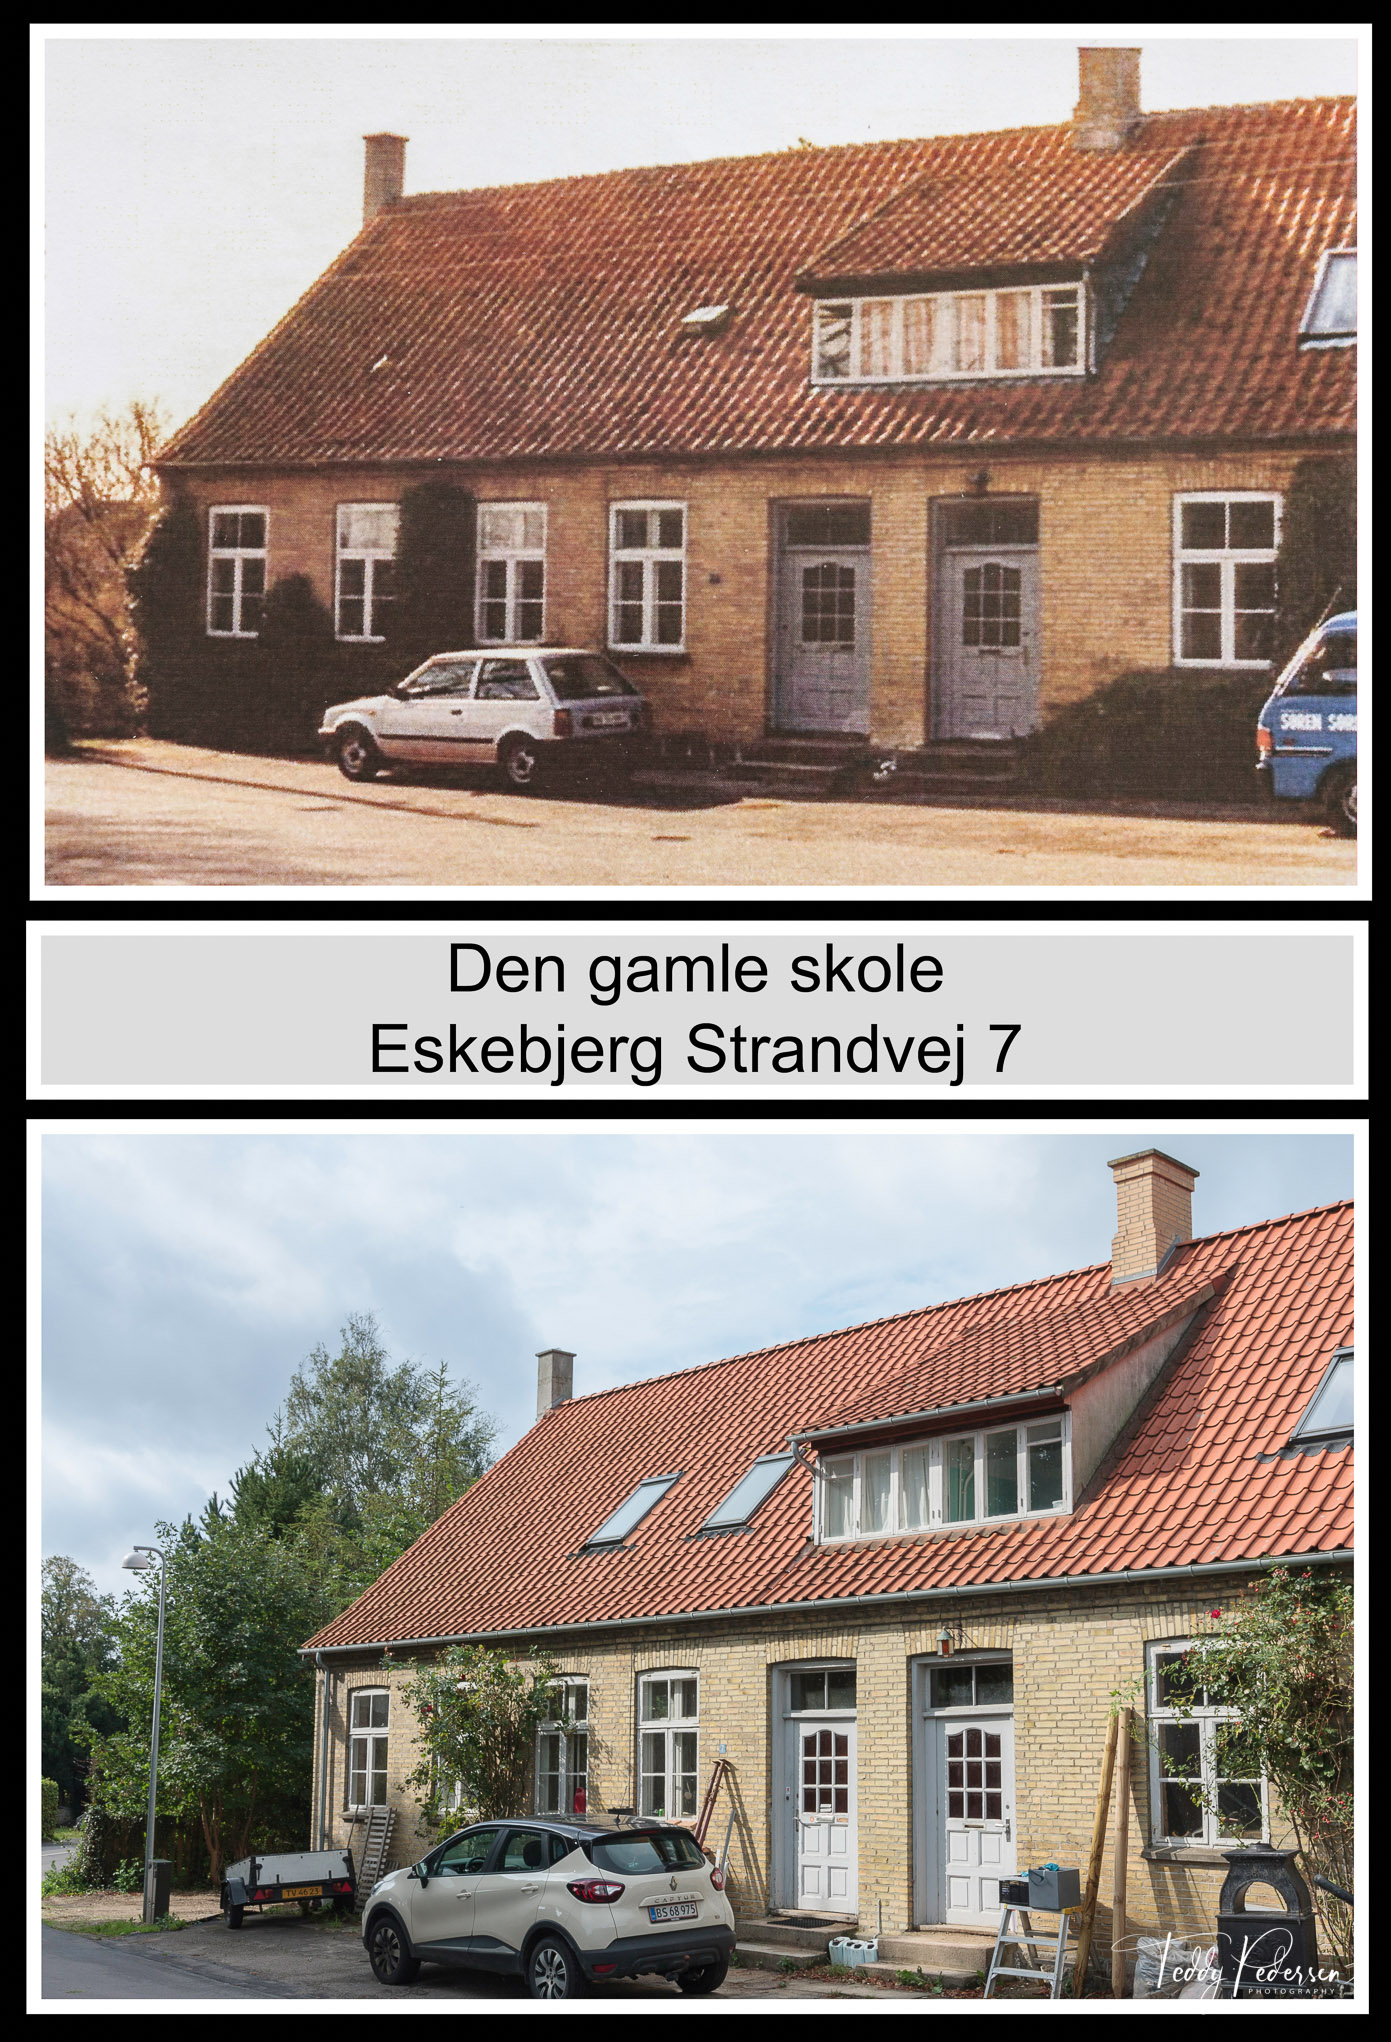 031-004-Den-gamle-skole-Eskebjerg-Strandvej-7_HighRes_LowRes